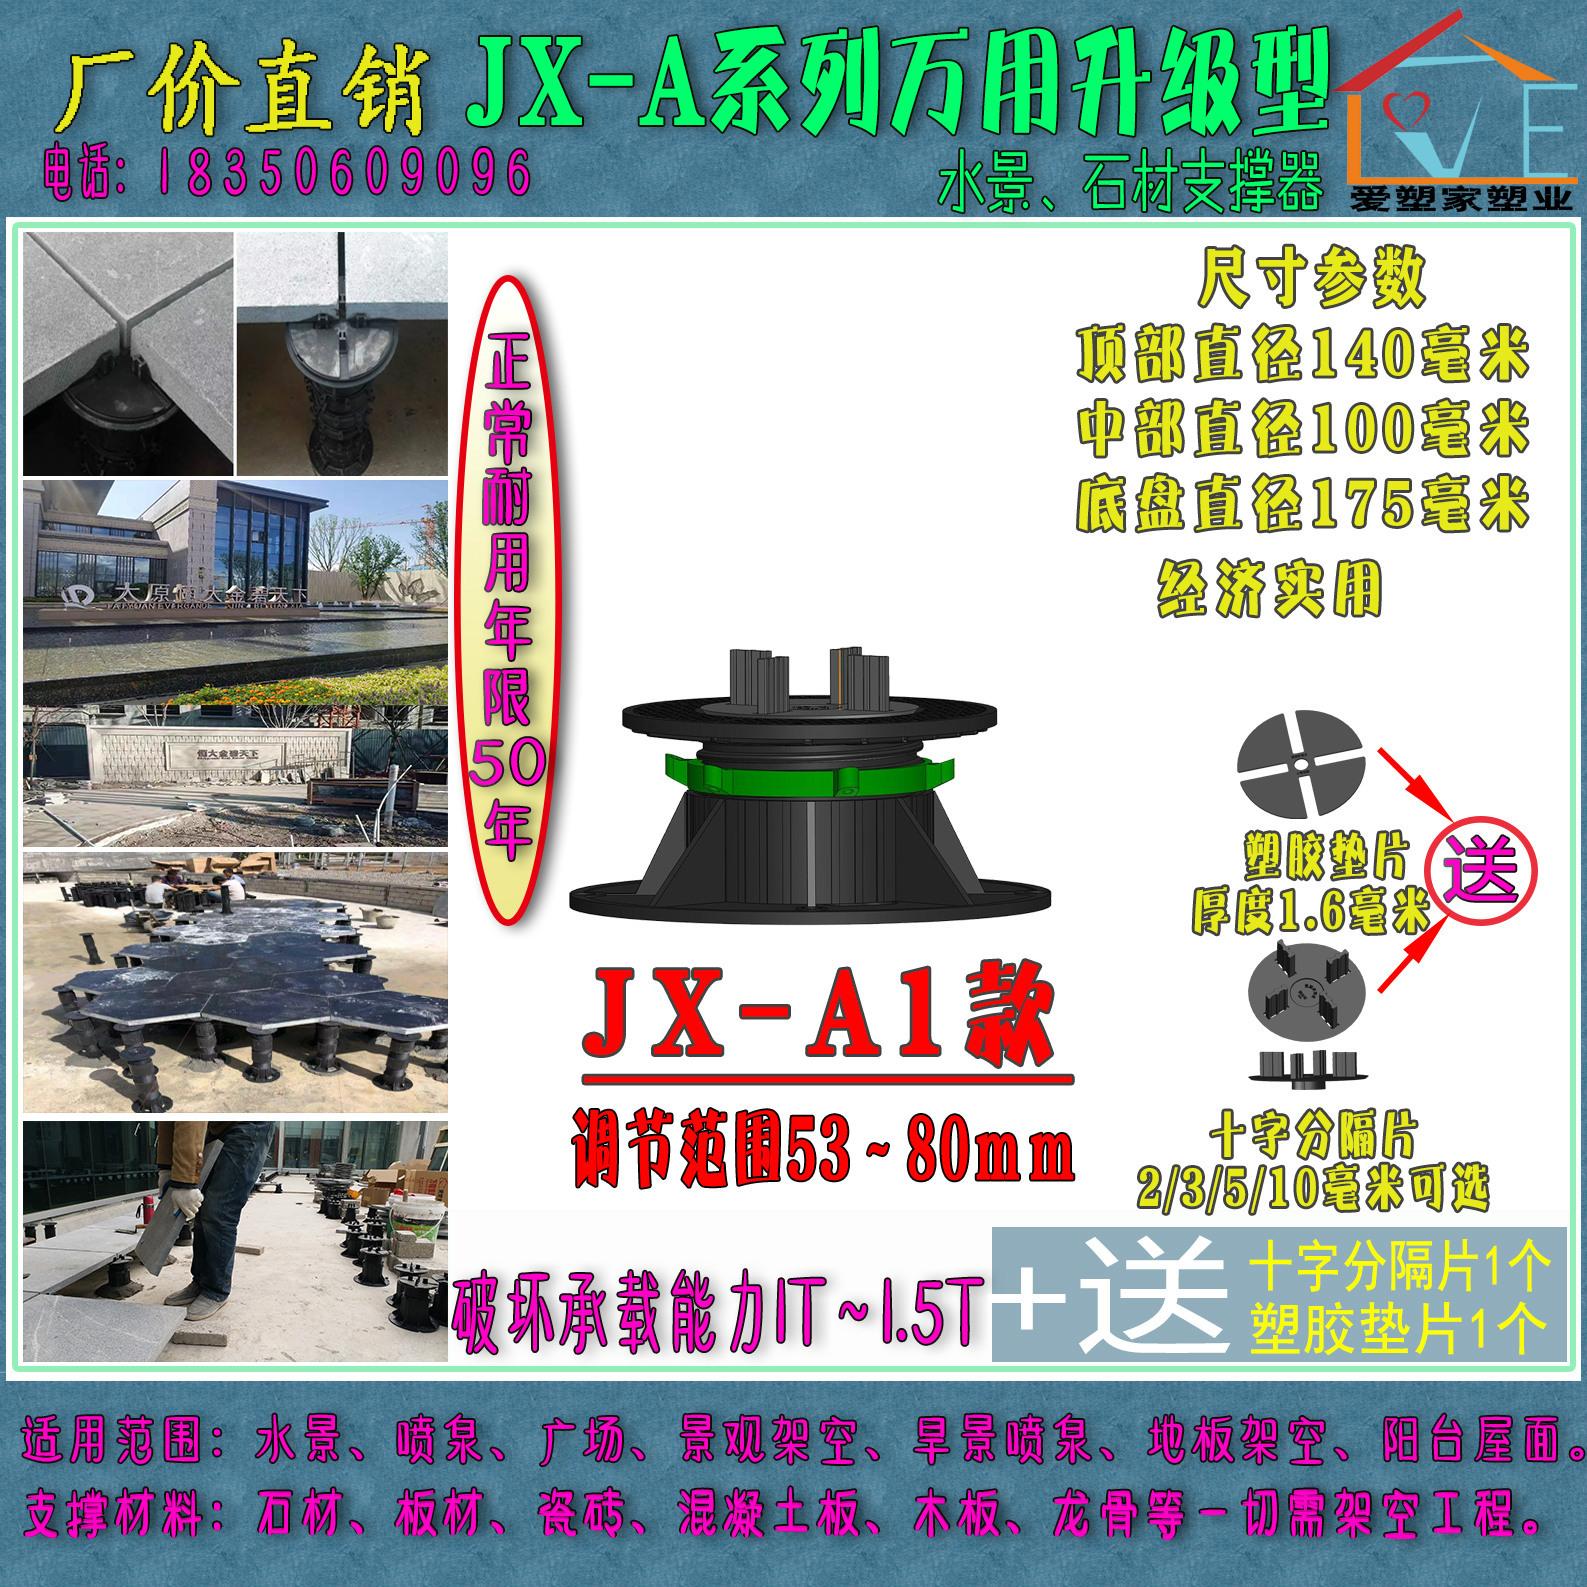 �f��֧���� ˮ�� ʯ�ļܿ� ˮ�صذ�ܸ��{���� JX-A1��53-80mm